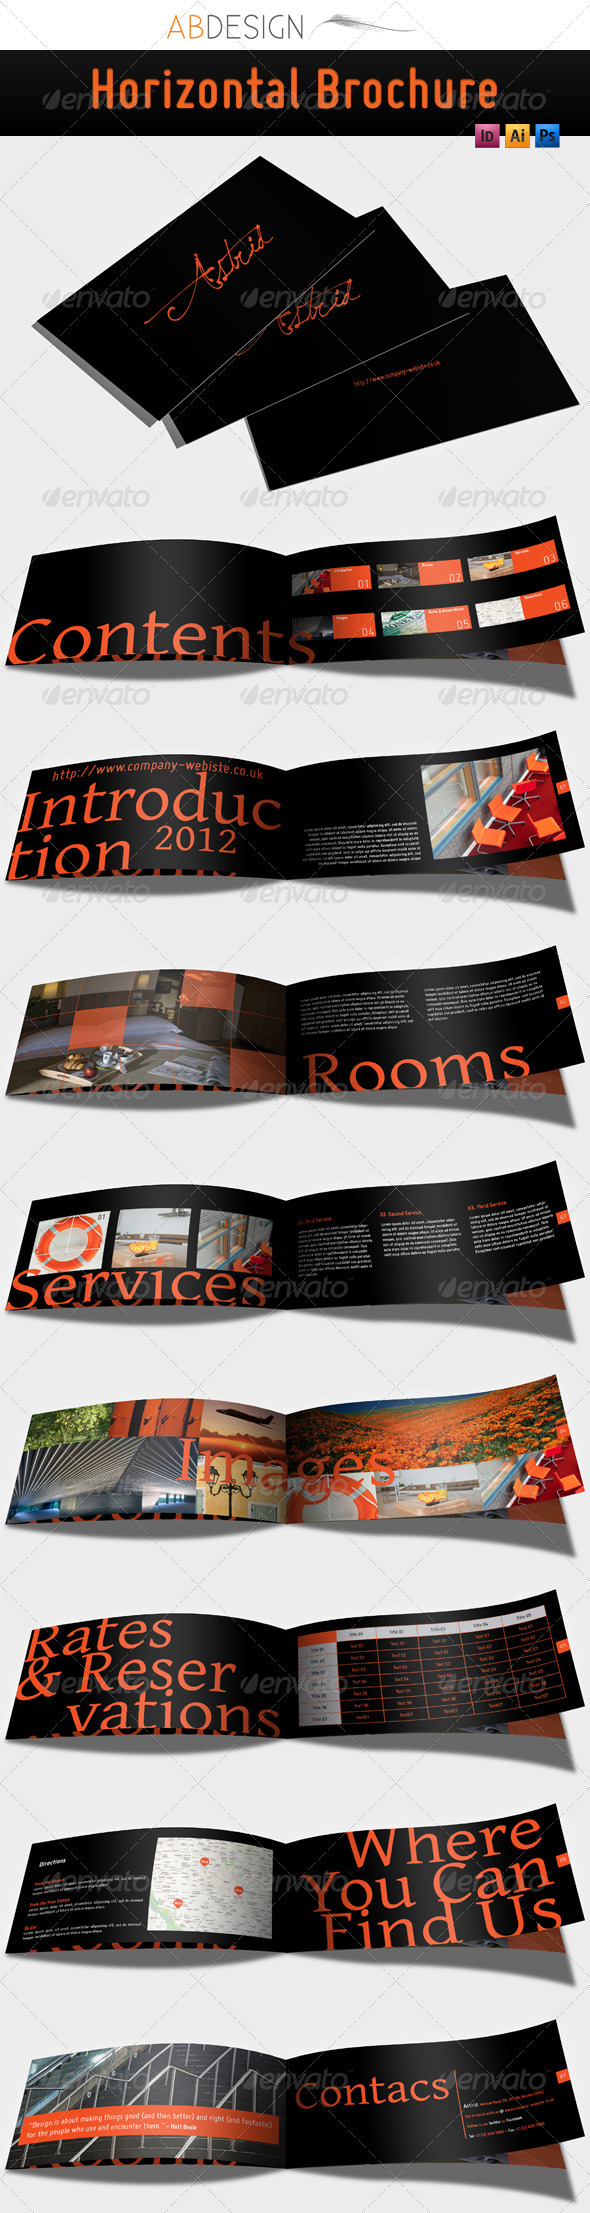 GraphicRiver Horizontal Brochure 507837